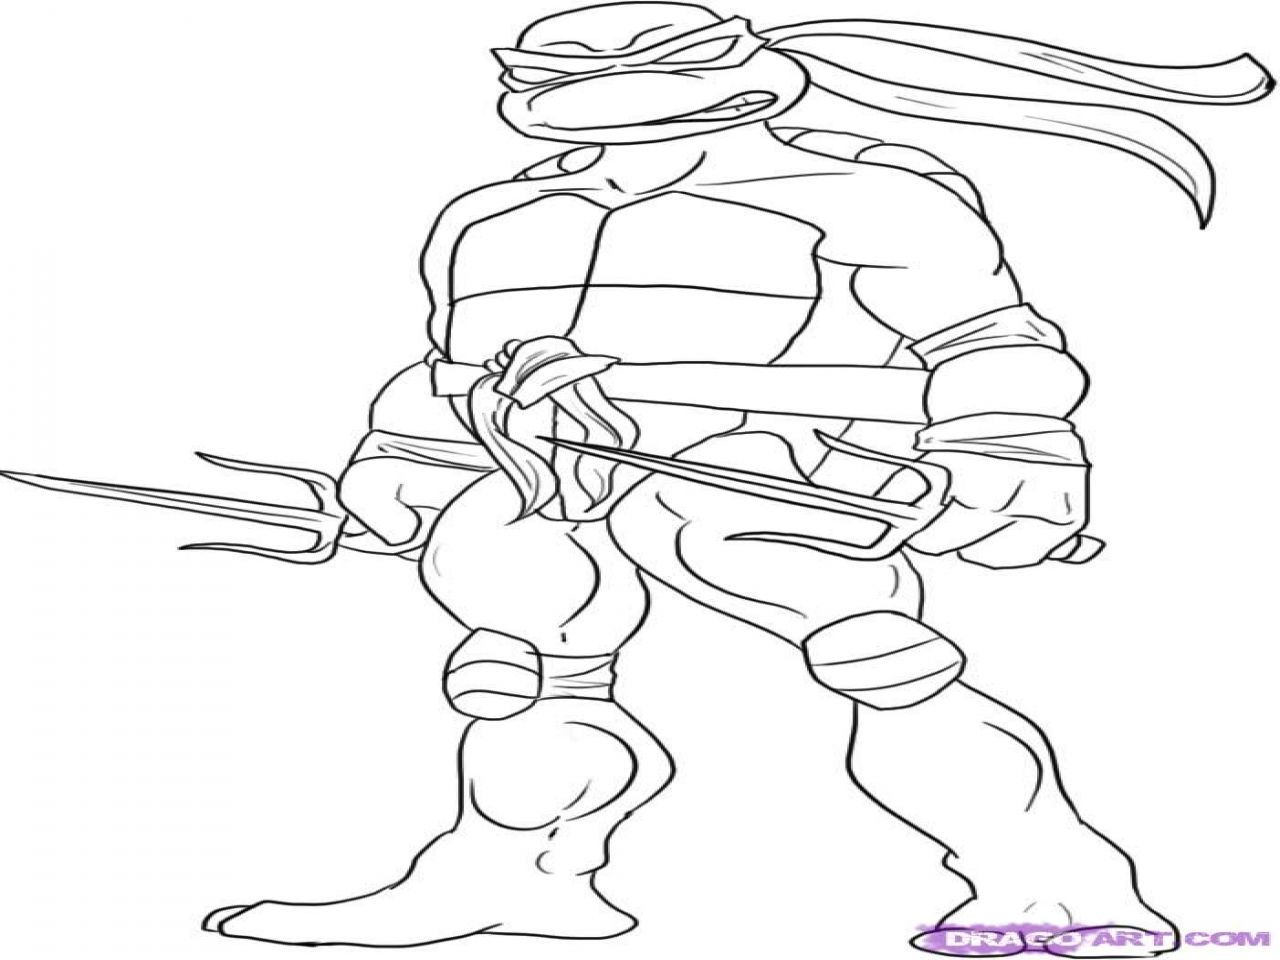 All Ninja Turtle Coloring Pages Teenage Mutant Ninja Turtles Turtle Coloring Pages Ninja Turtle Coloring Pages Superhero Coloring Pages